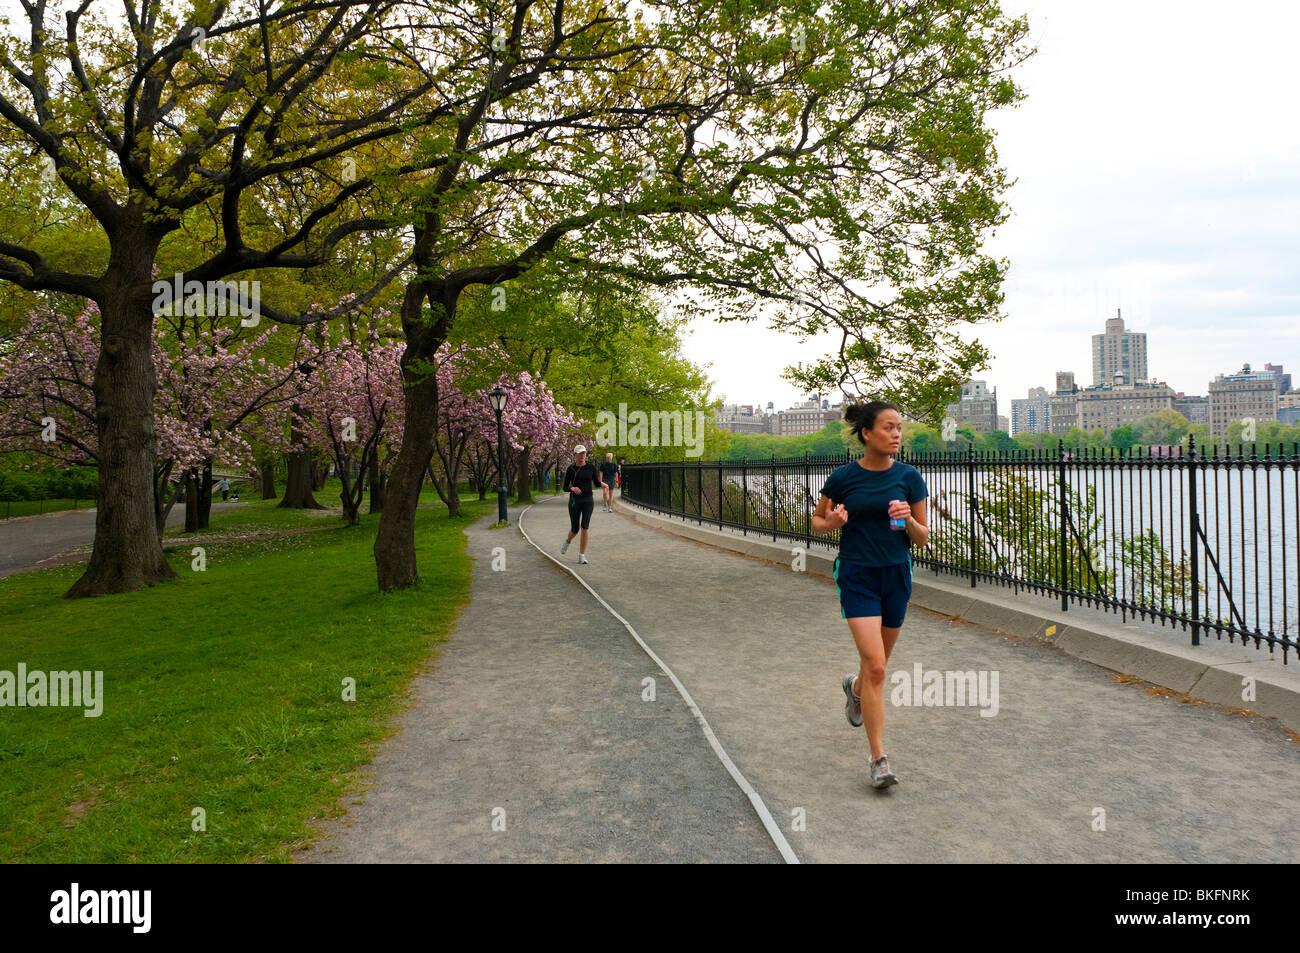 2 Mile Run Imágenes De Stock & 2 Mile Run Fotos De Stock - Alamy